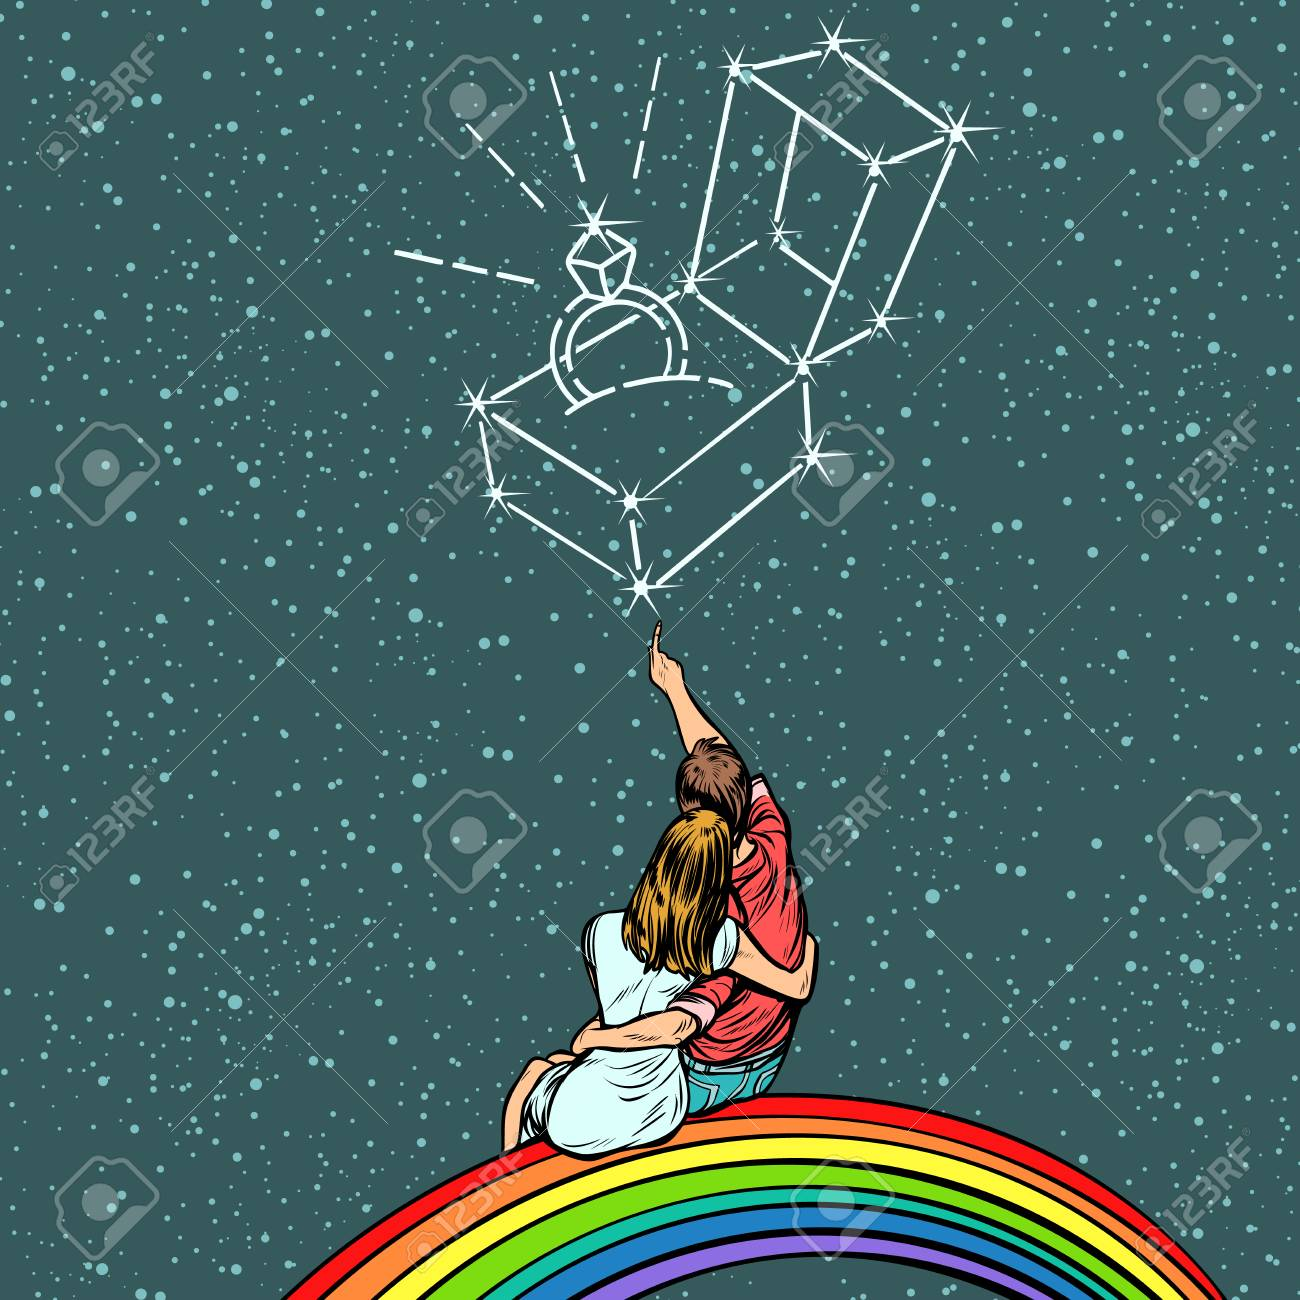 Couple man and woman dreaming of a wedding. Pop art retro comics cartoon vector illustration kitsch drawing - 98561896